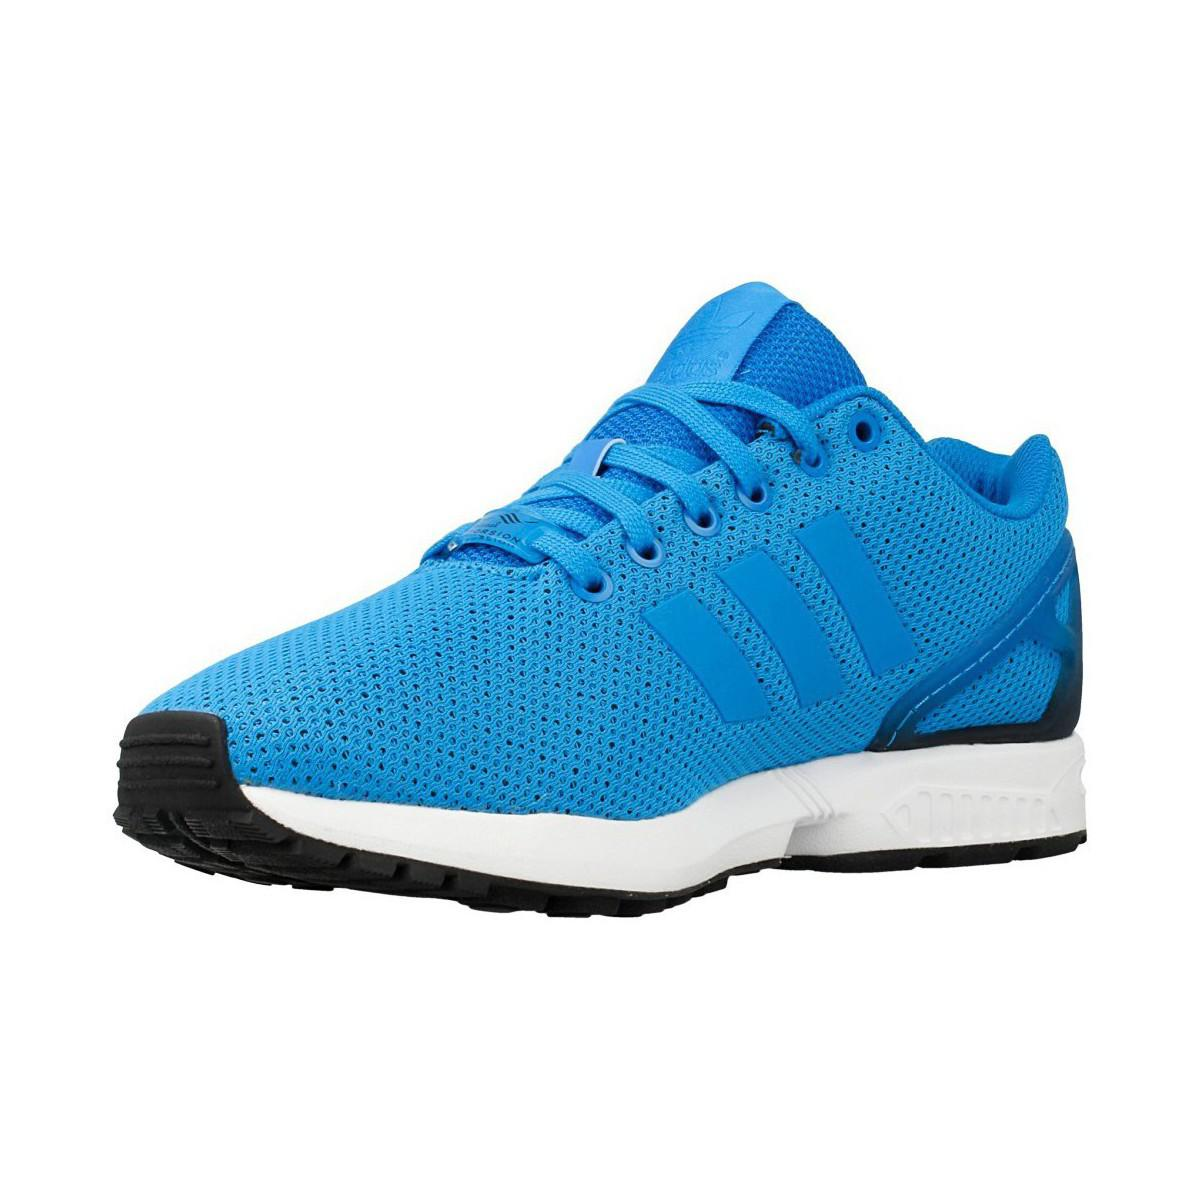 de782692d51 ... france adidas zx flux mens shoes trainers in blue in blue for men lyst  cdfca 286d0